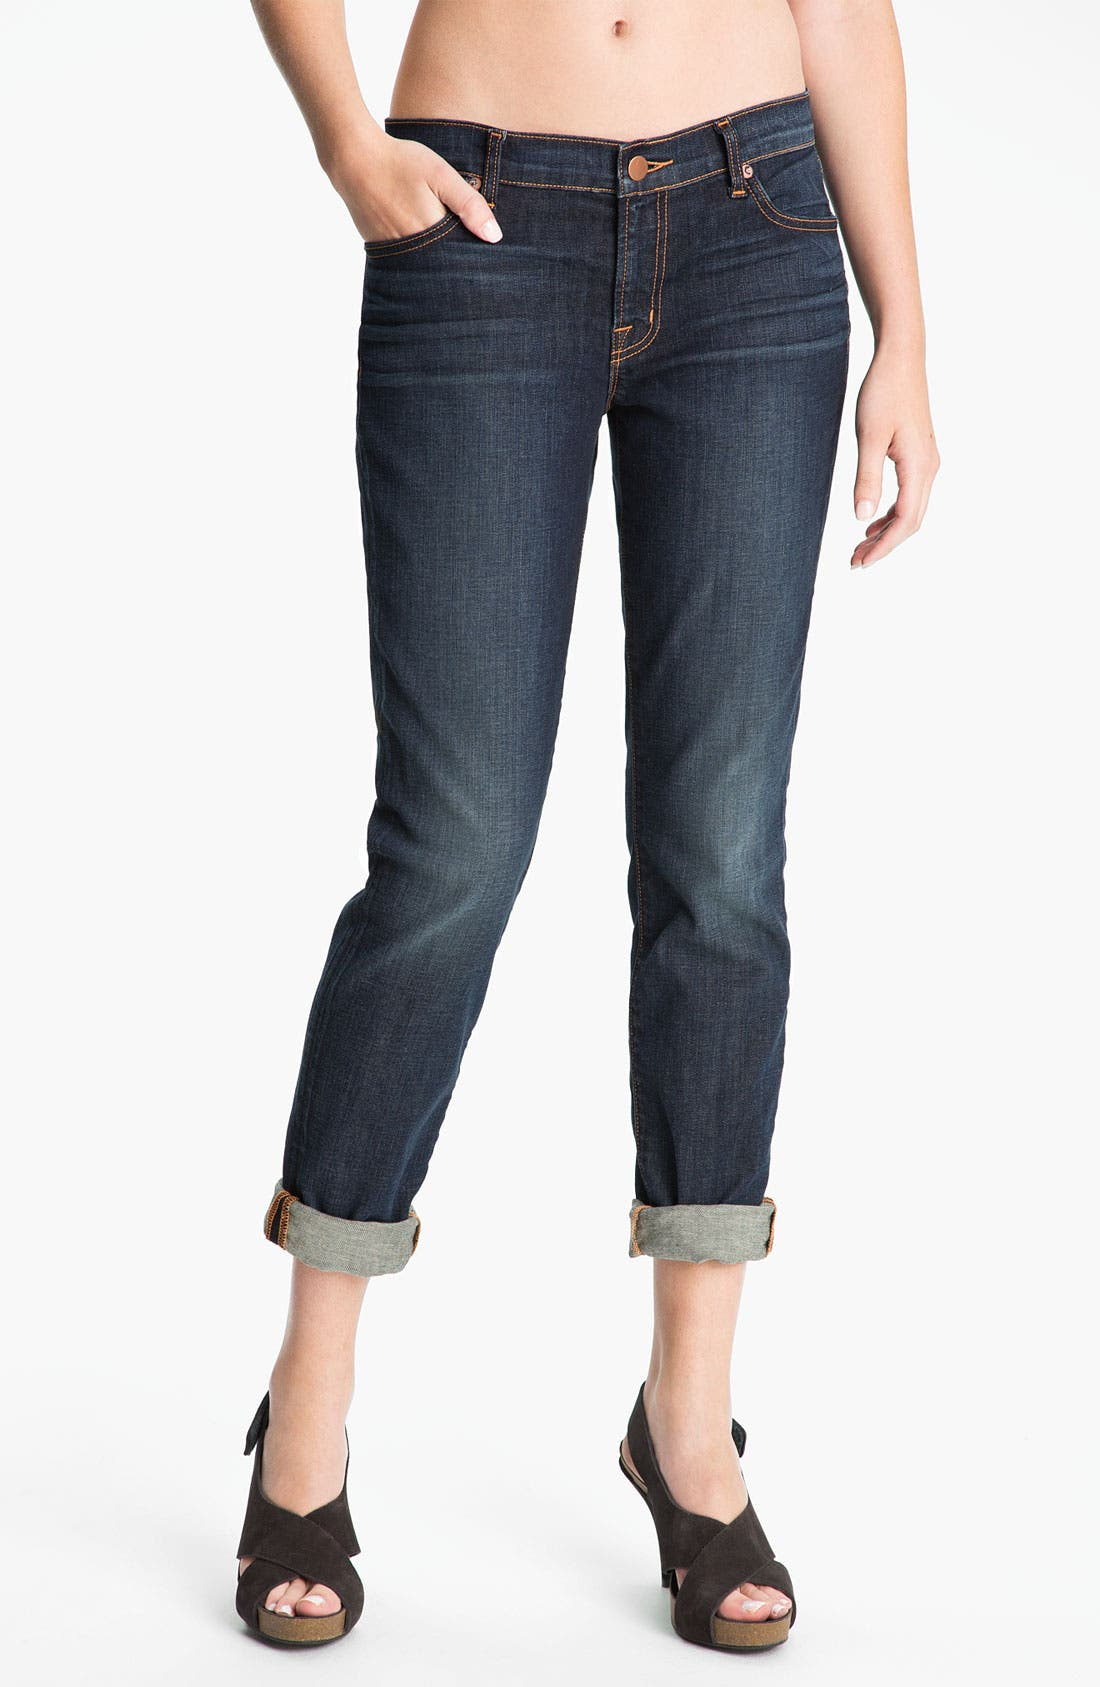 Main Image - J Brand 'Midori' Stretch Jeans (Dark Vintage)